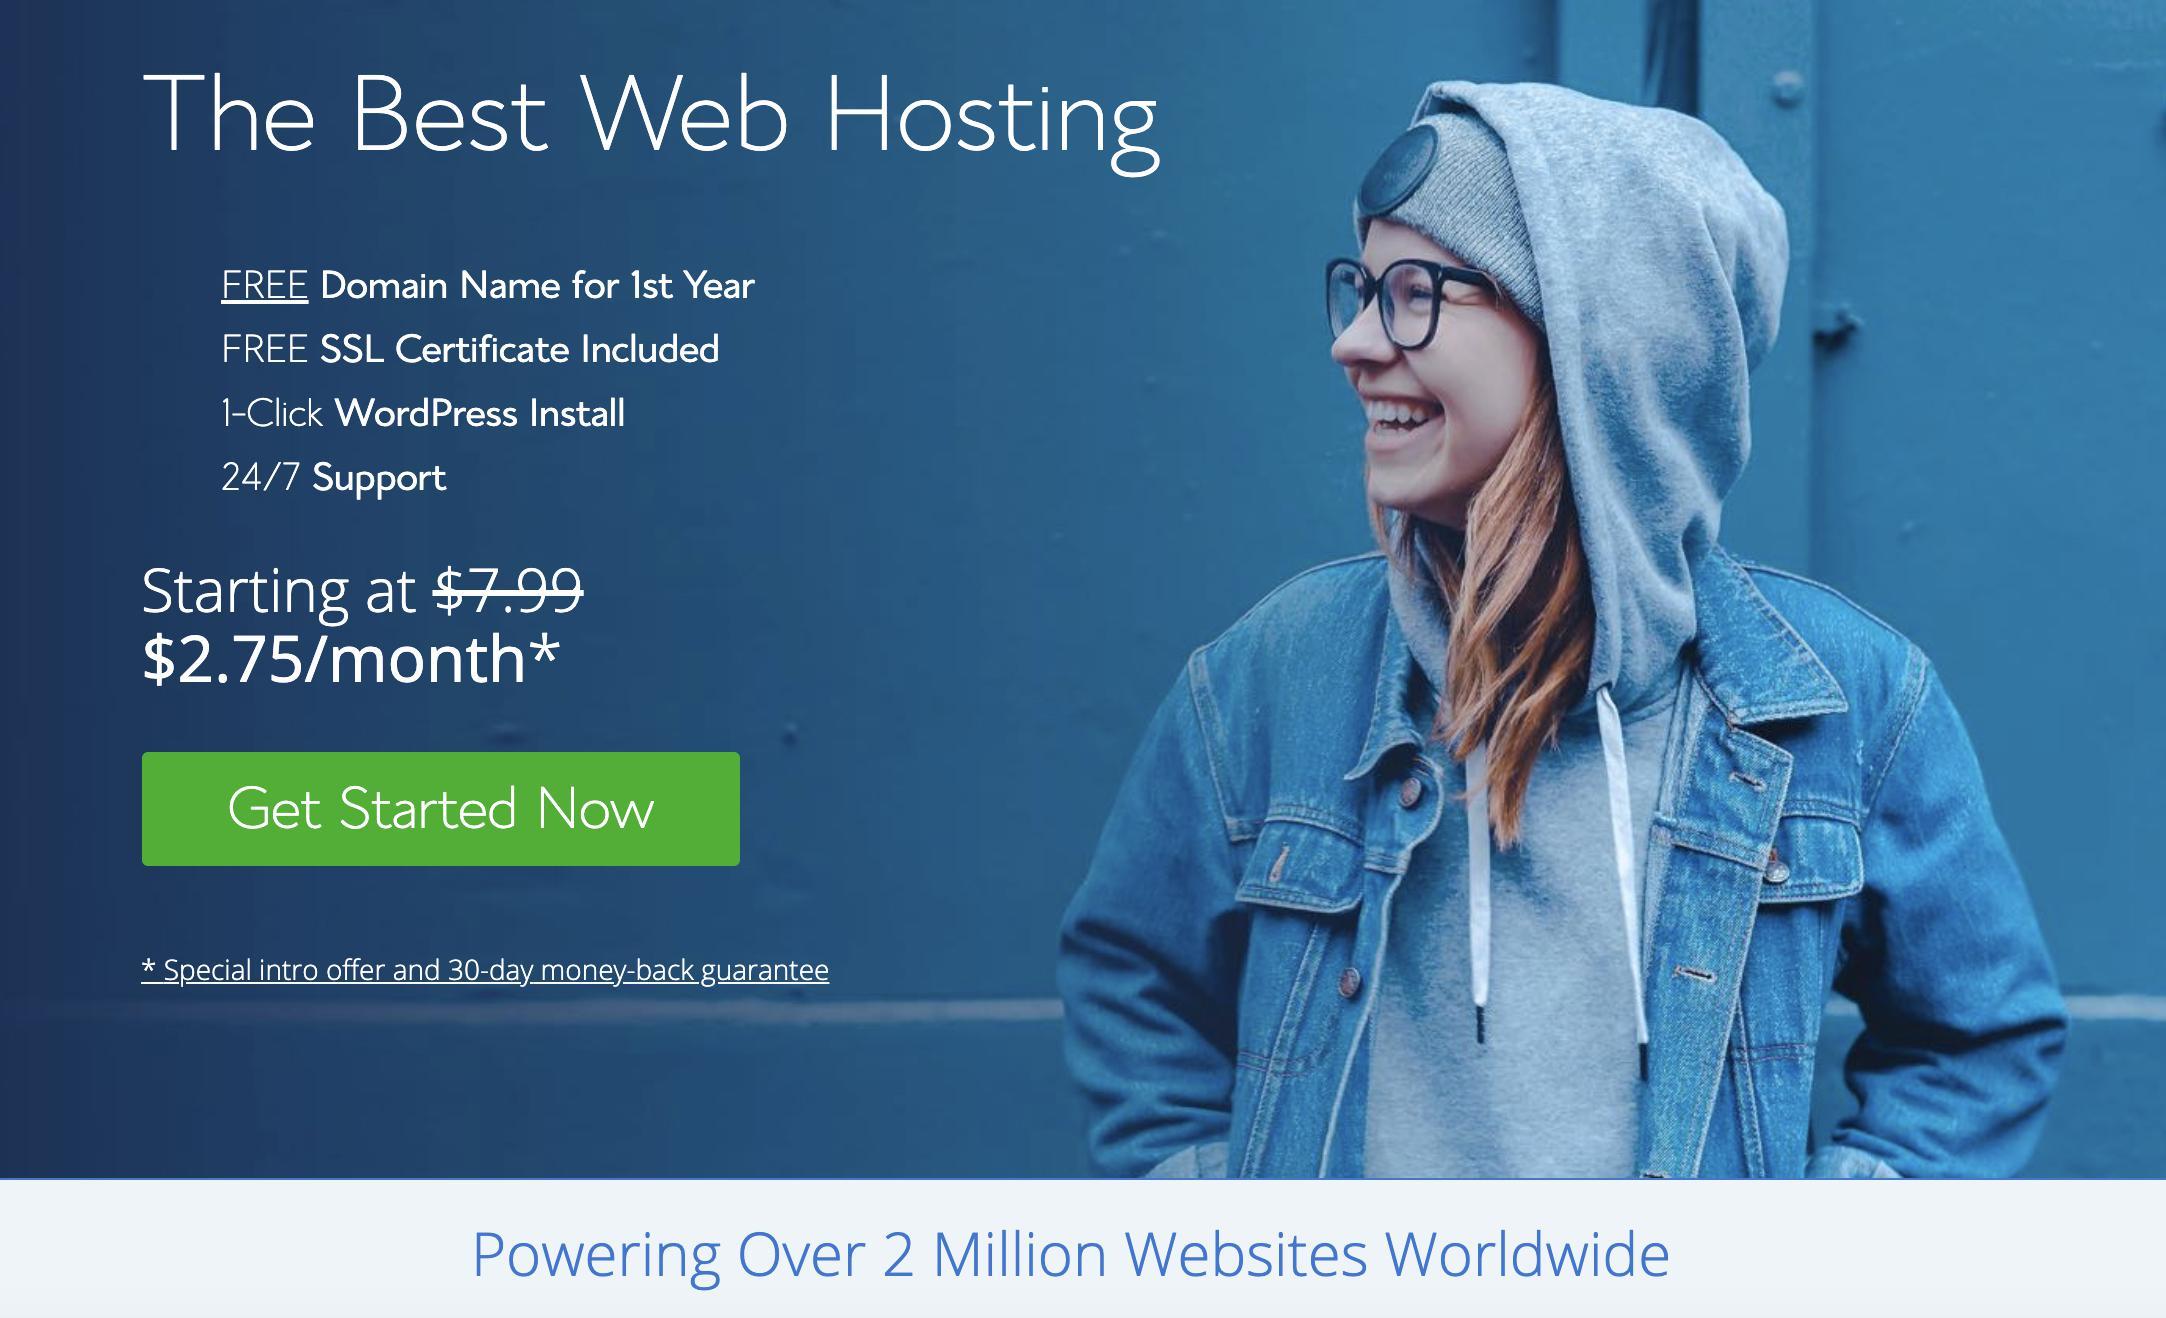 Перенести блог с Weebly на WordPress - Пошаговое руководство 2020